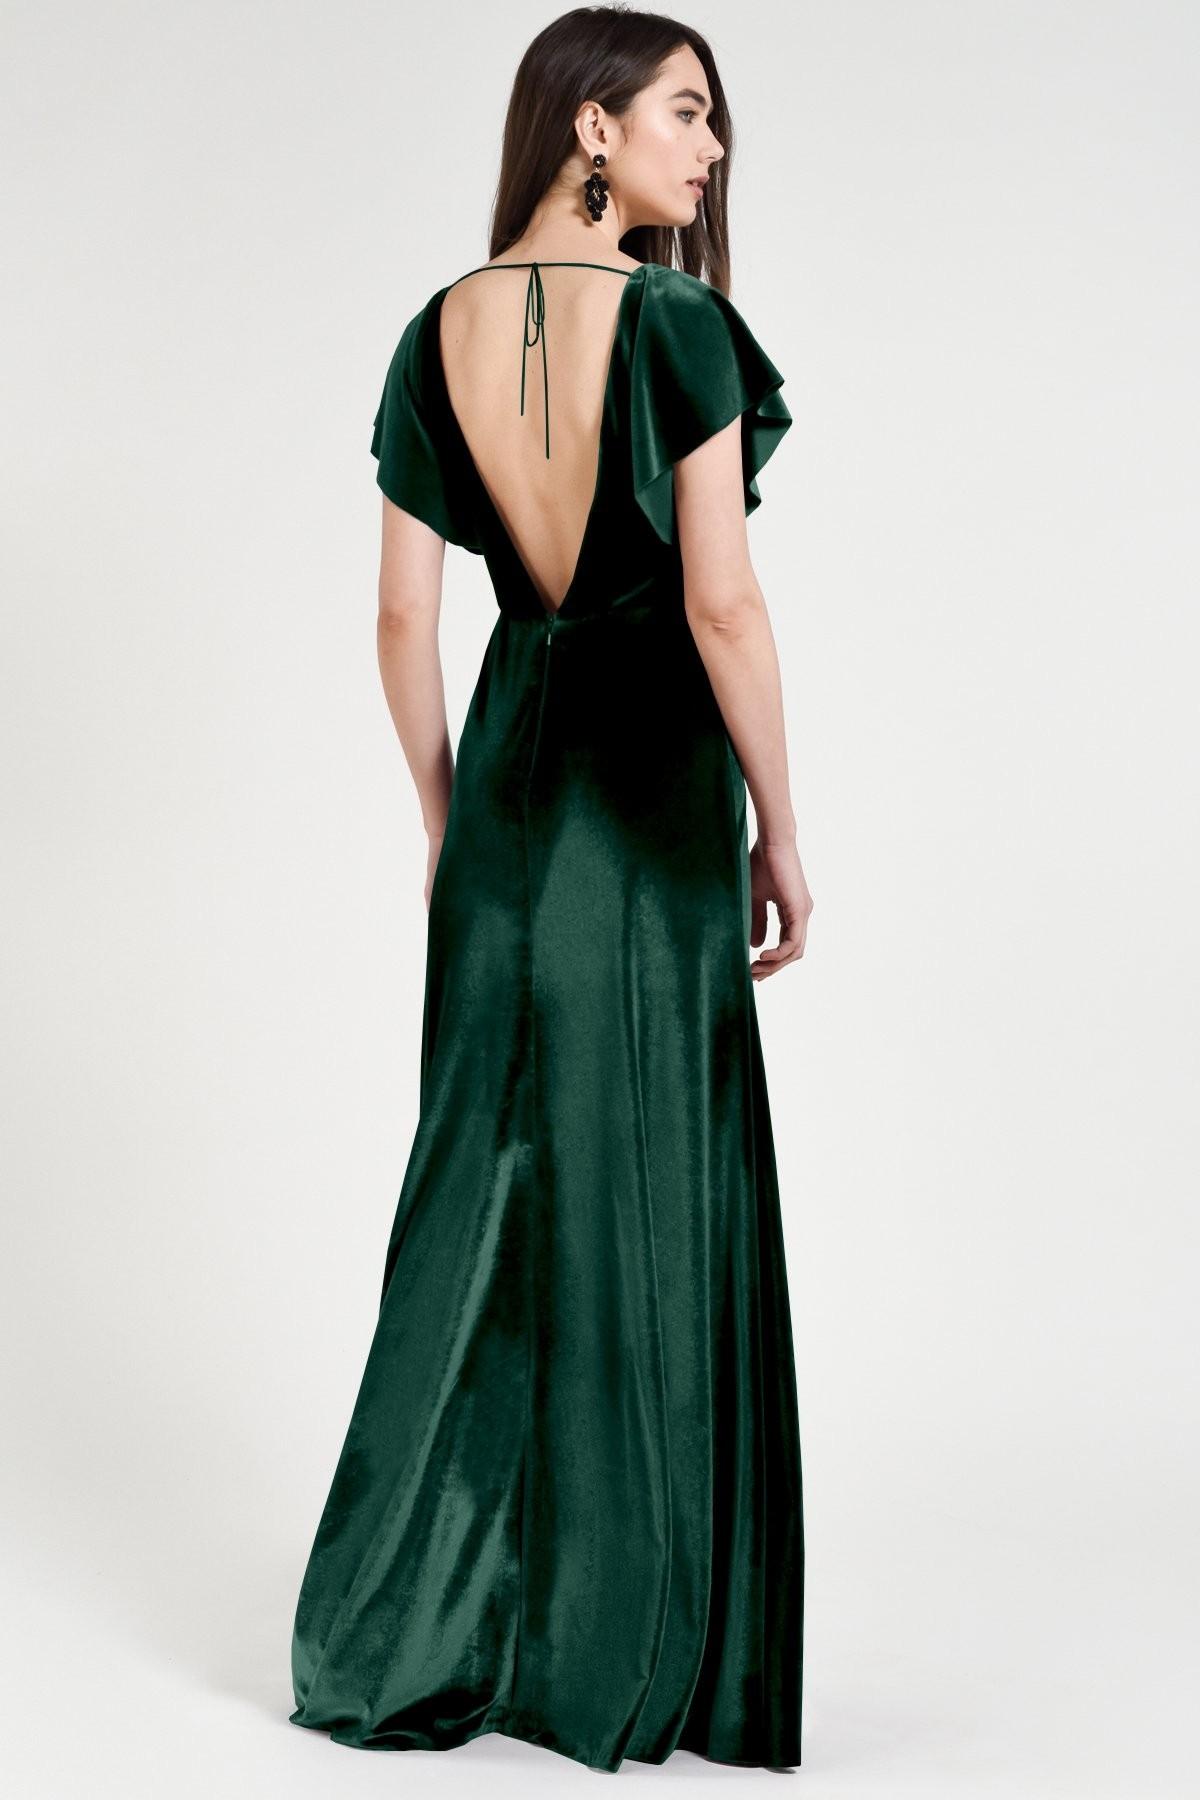 Ellis Bridesmaids Dress by Jenny Yoo - Emerald